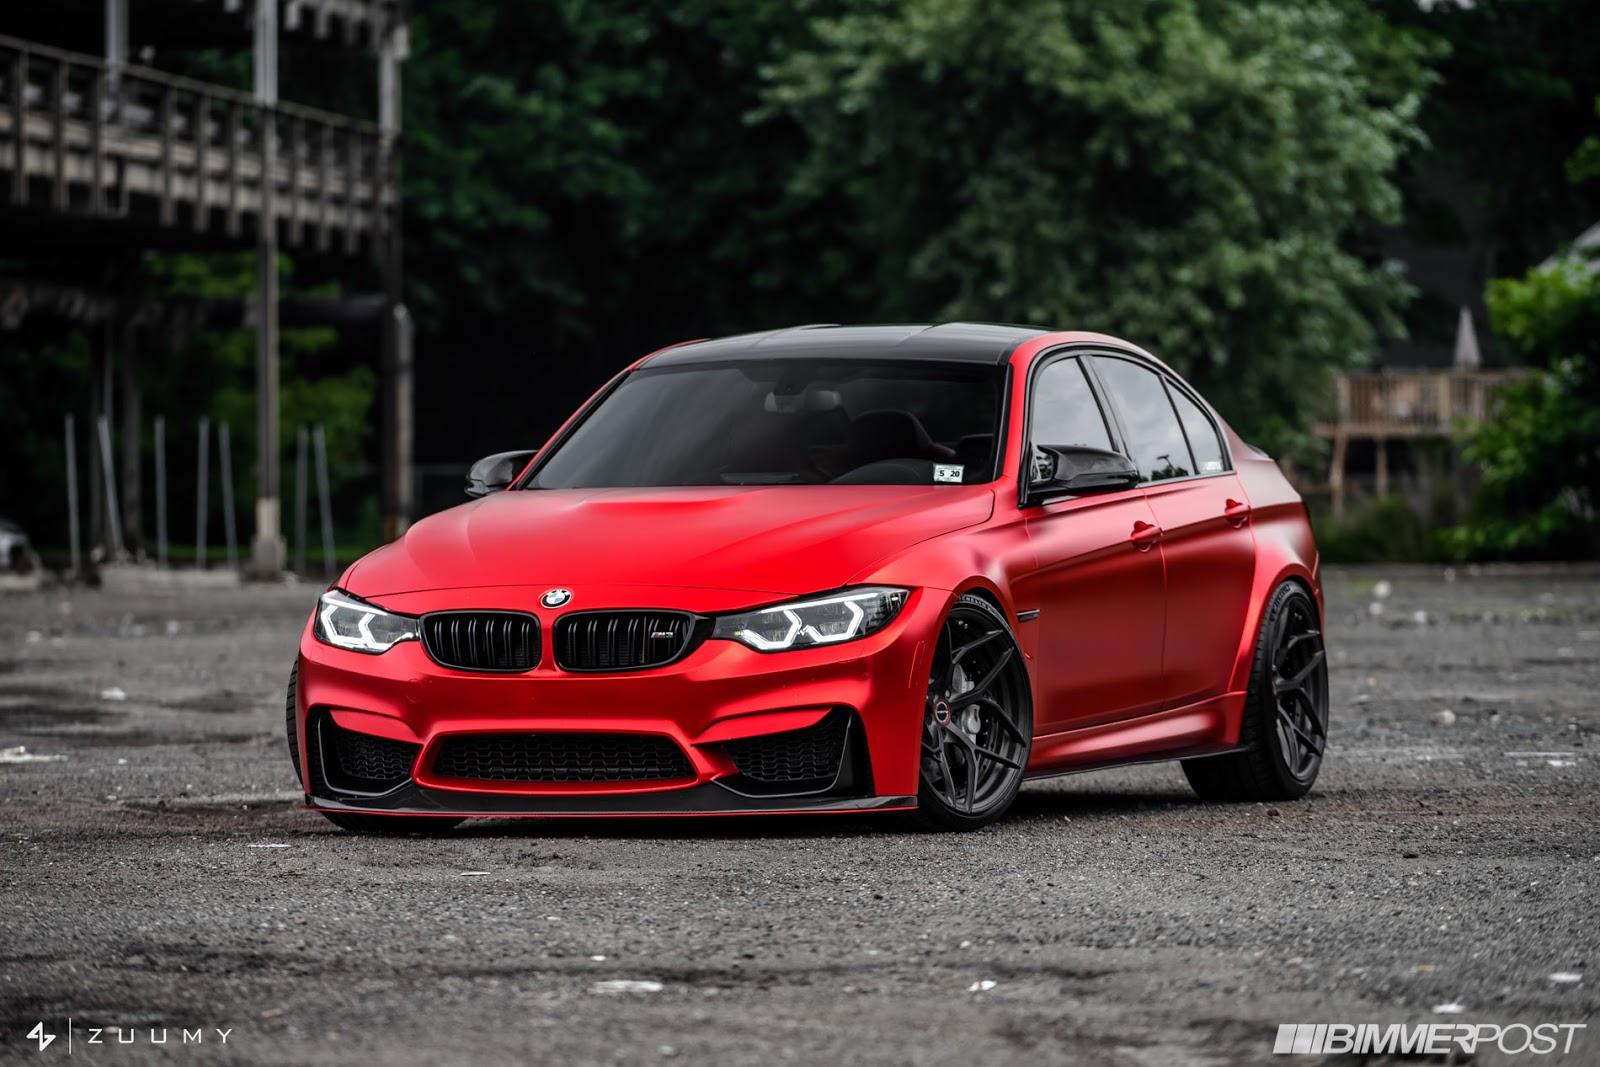 Сатенено червено BMW M3 - защо не? (ГАЛЕРИЯ)